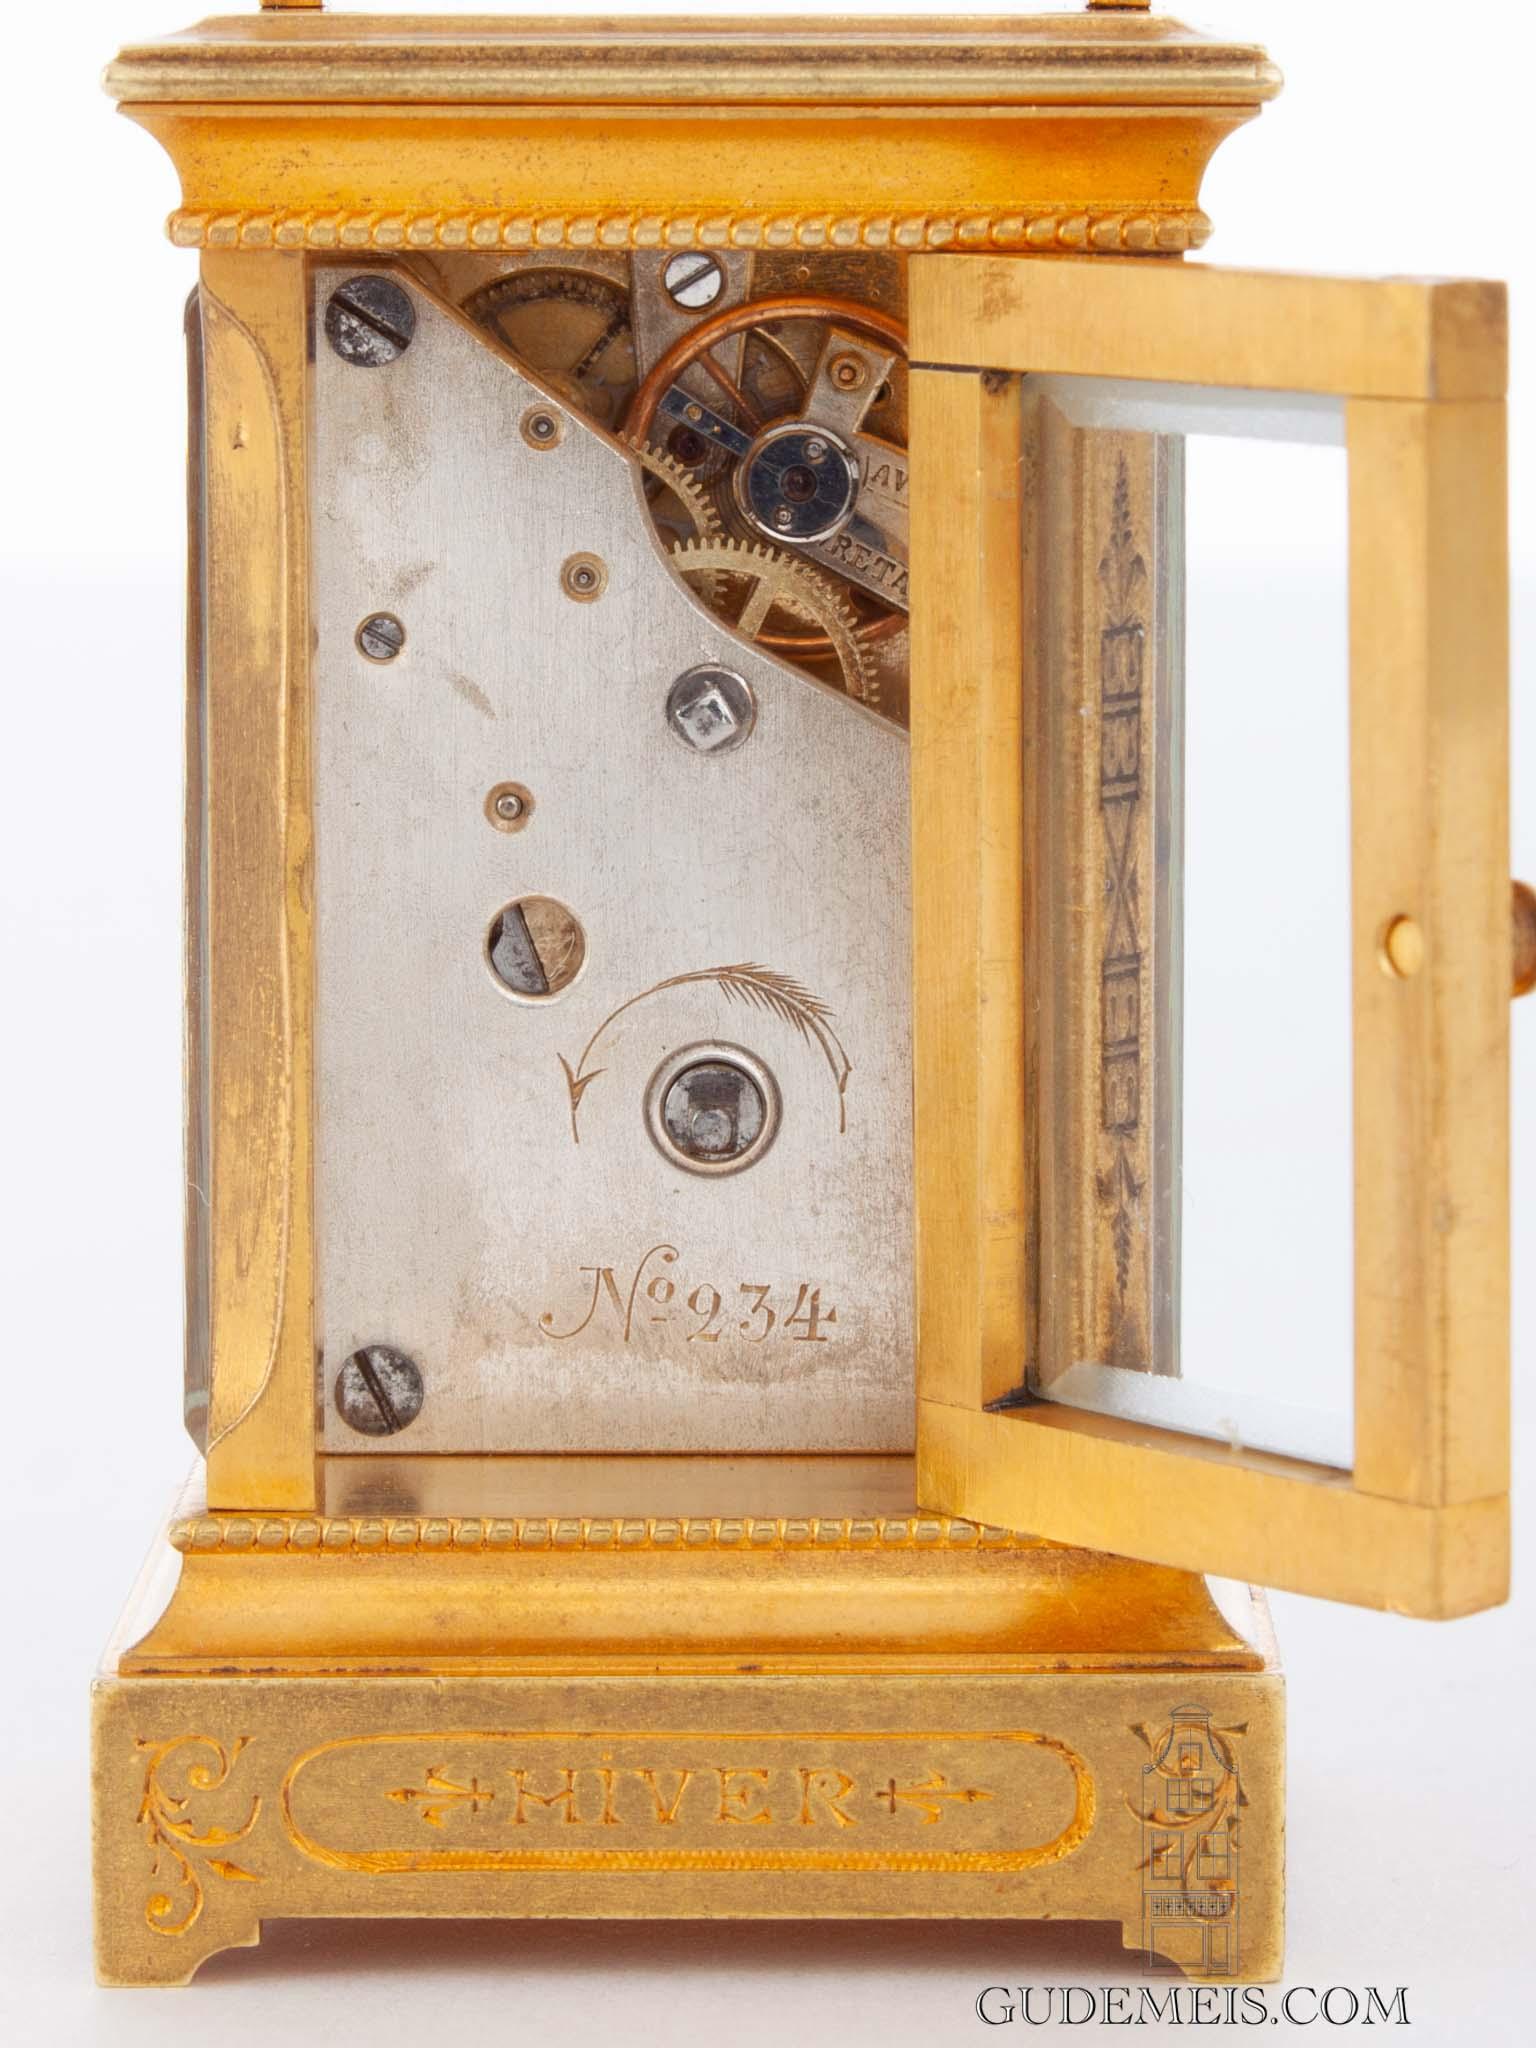 miniature-Swiss-gilt-brass-anglaise-case-polychrome-enamel-gilt-brass-antique-travel-carriage-clock-enamel-dial-